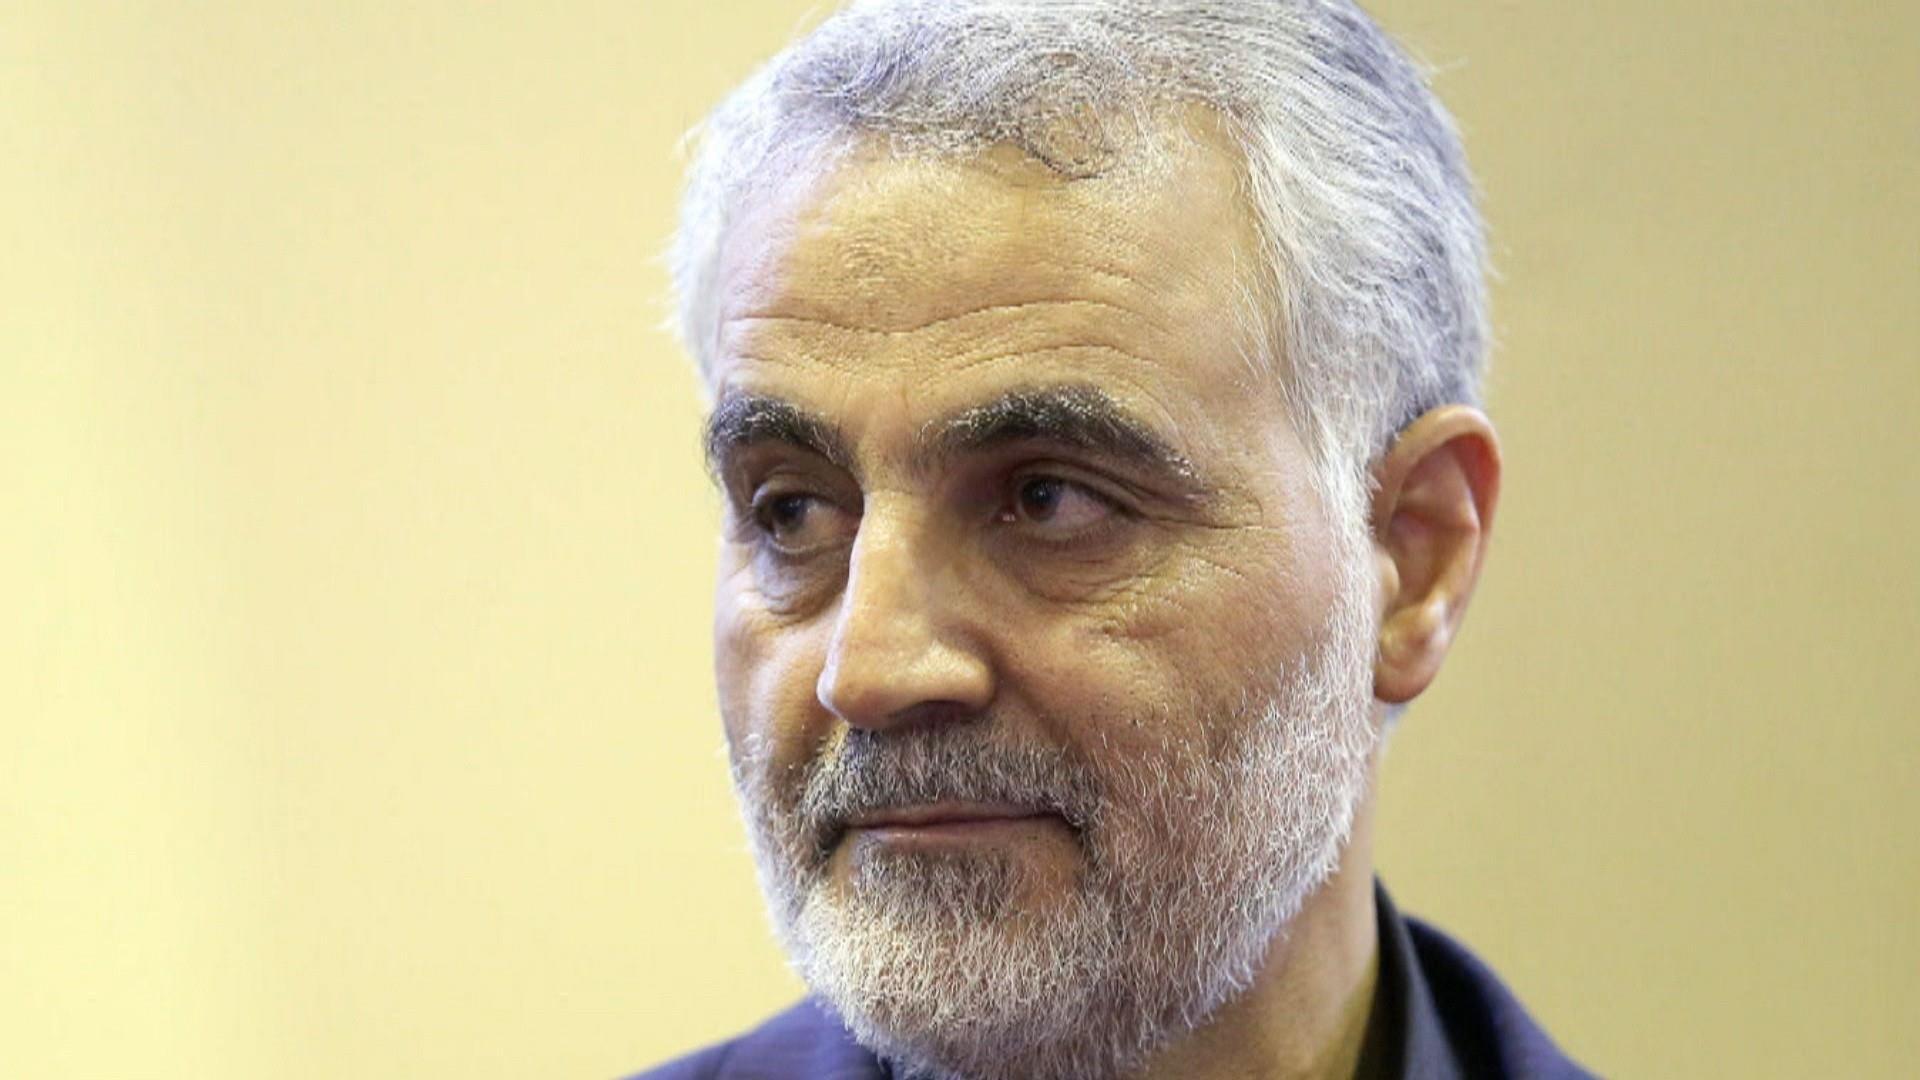 Looking iranian men good The 10